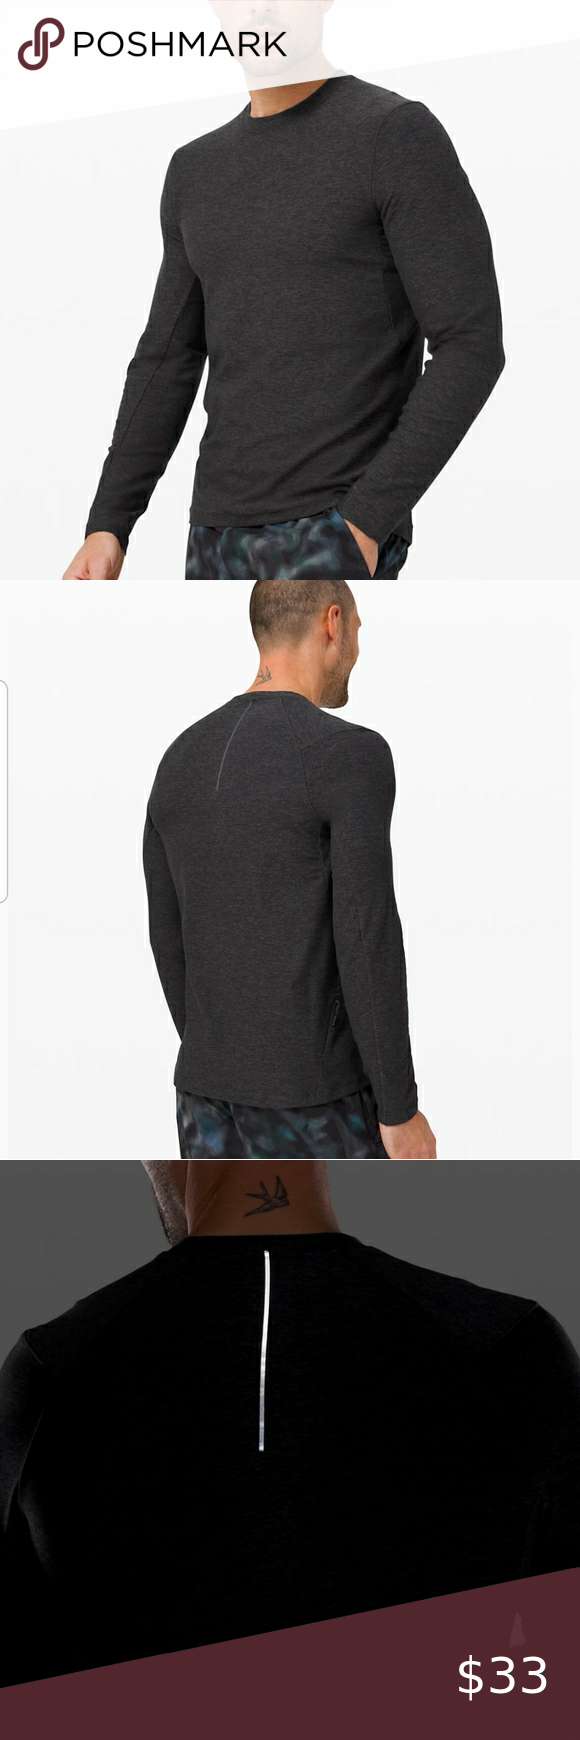 Mens Lululemon Dark Gray Crewneck Sweatshirt Crew Neck Sweatshirt Clothes Design Sweatshirts [ 1740 x 580 Pixel ]